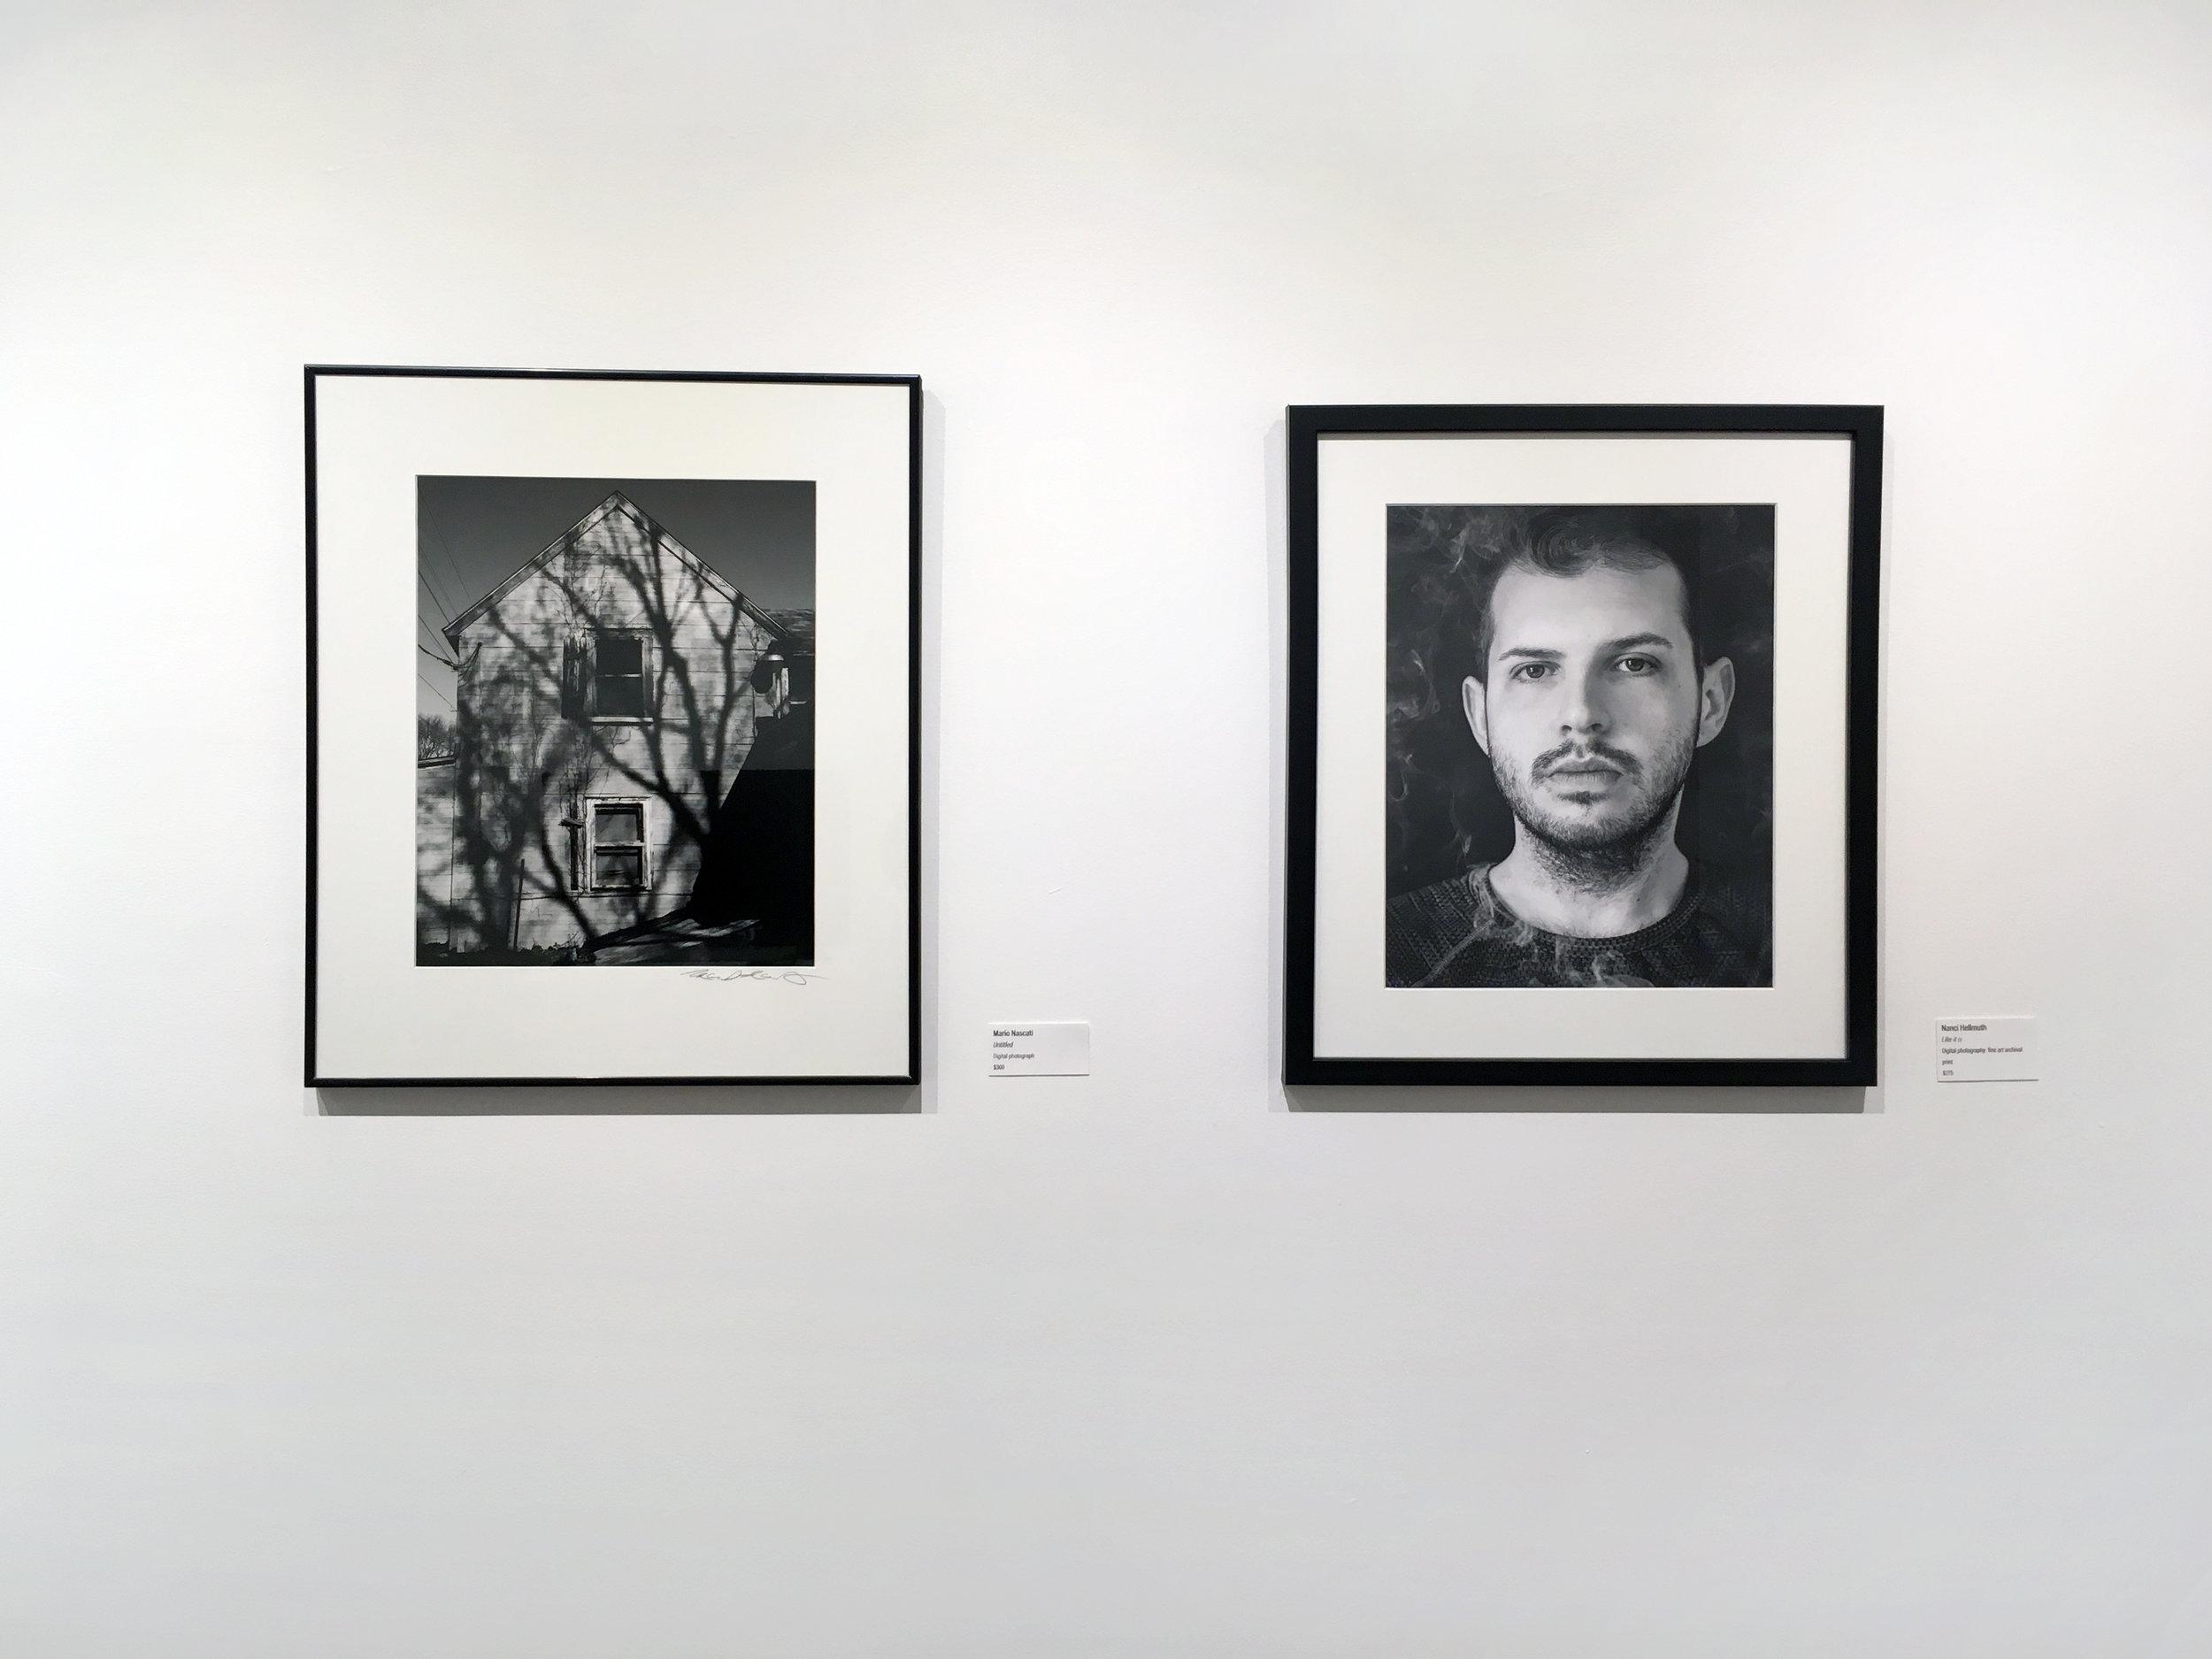 Left: Mario Nascati,  Untitled , digital photograph; Right: Nanci Hellmuth,  Like it is , digital photograph. Courtesy of Da Vinci Art Alliance